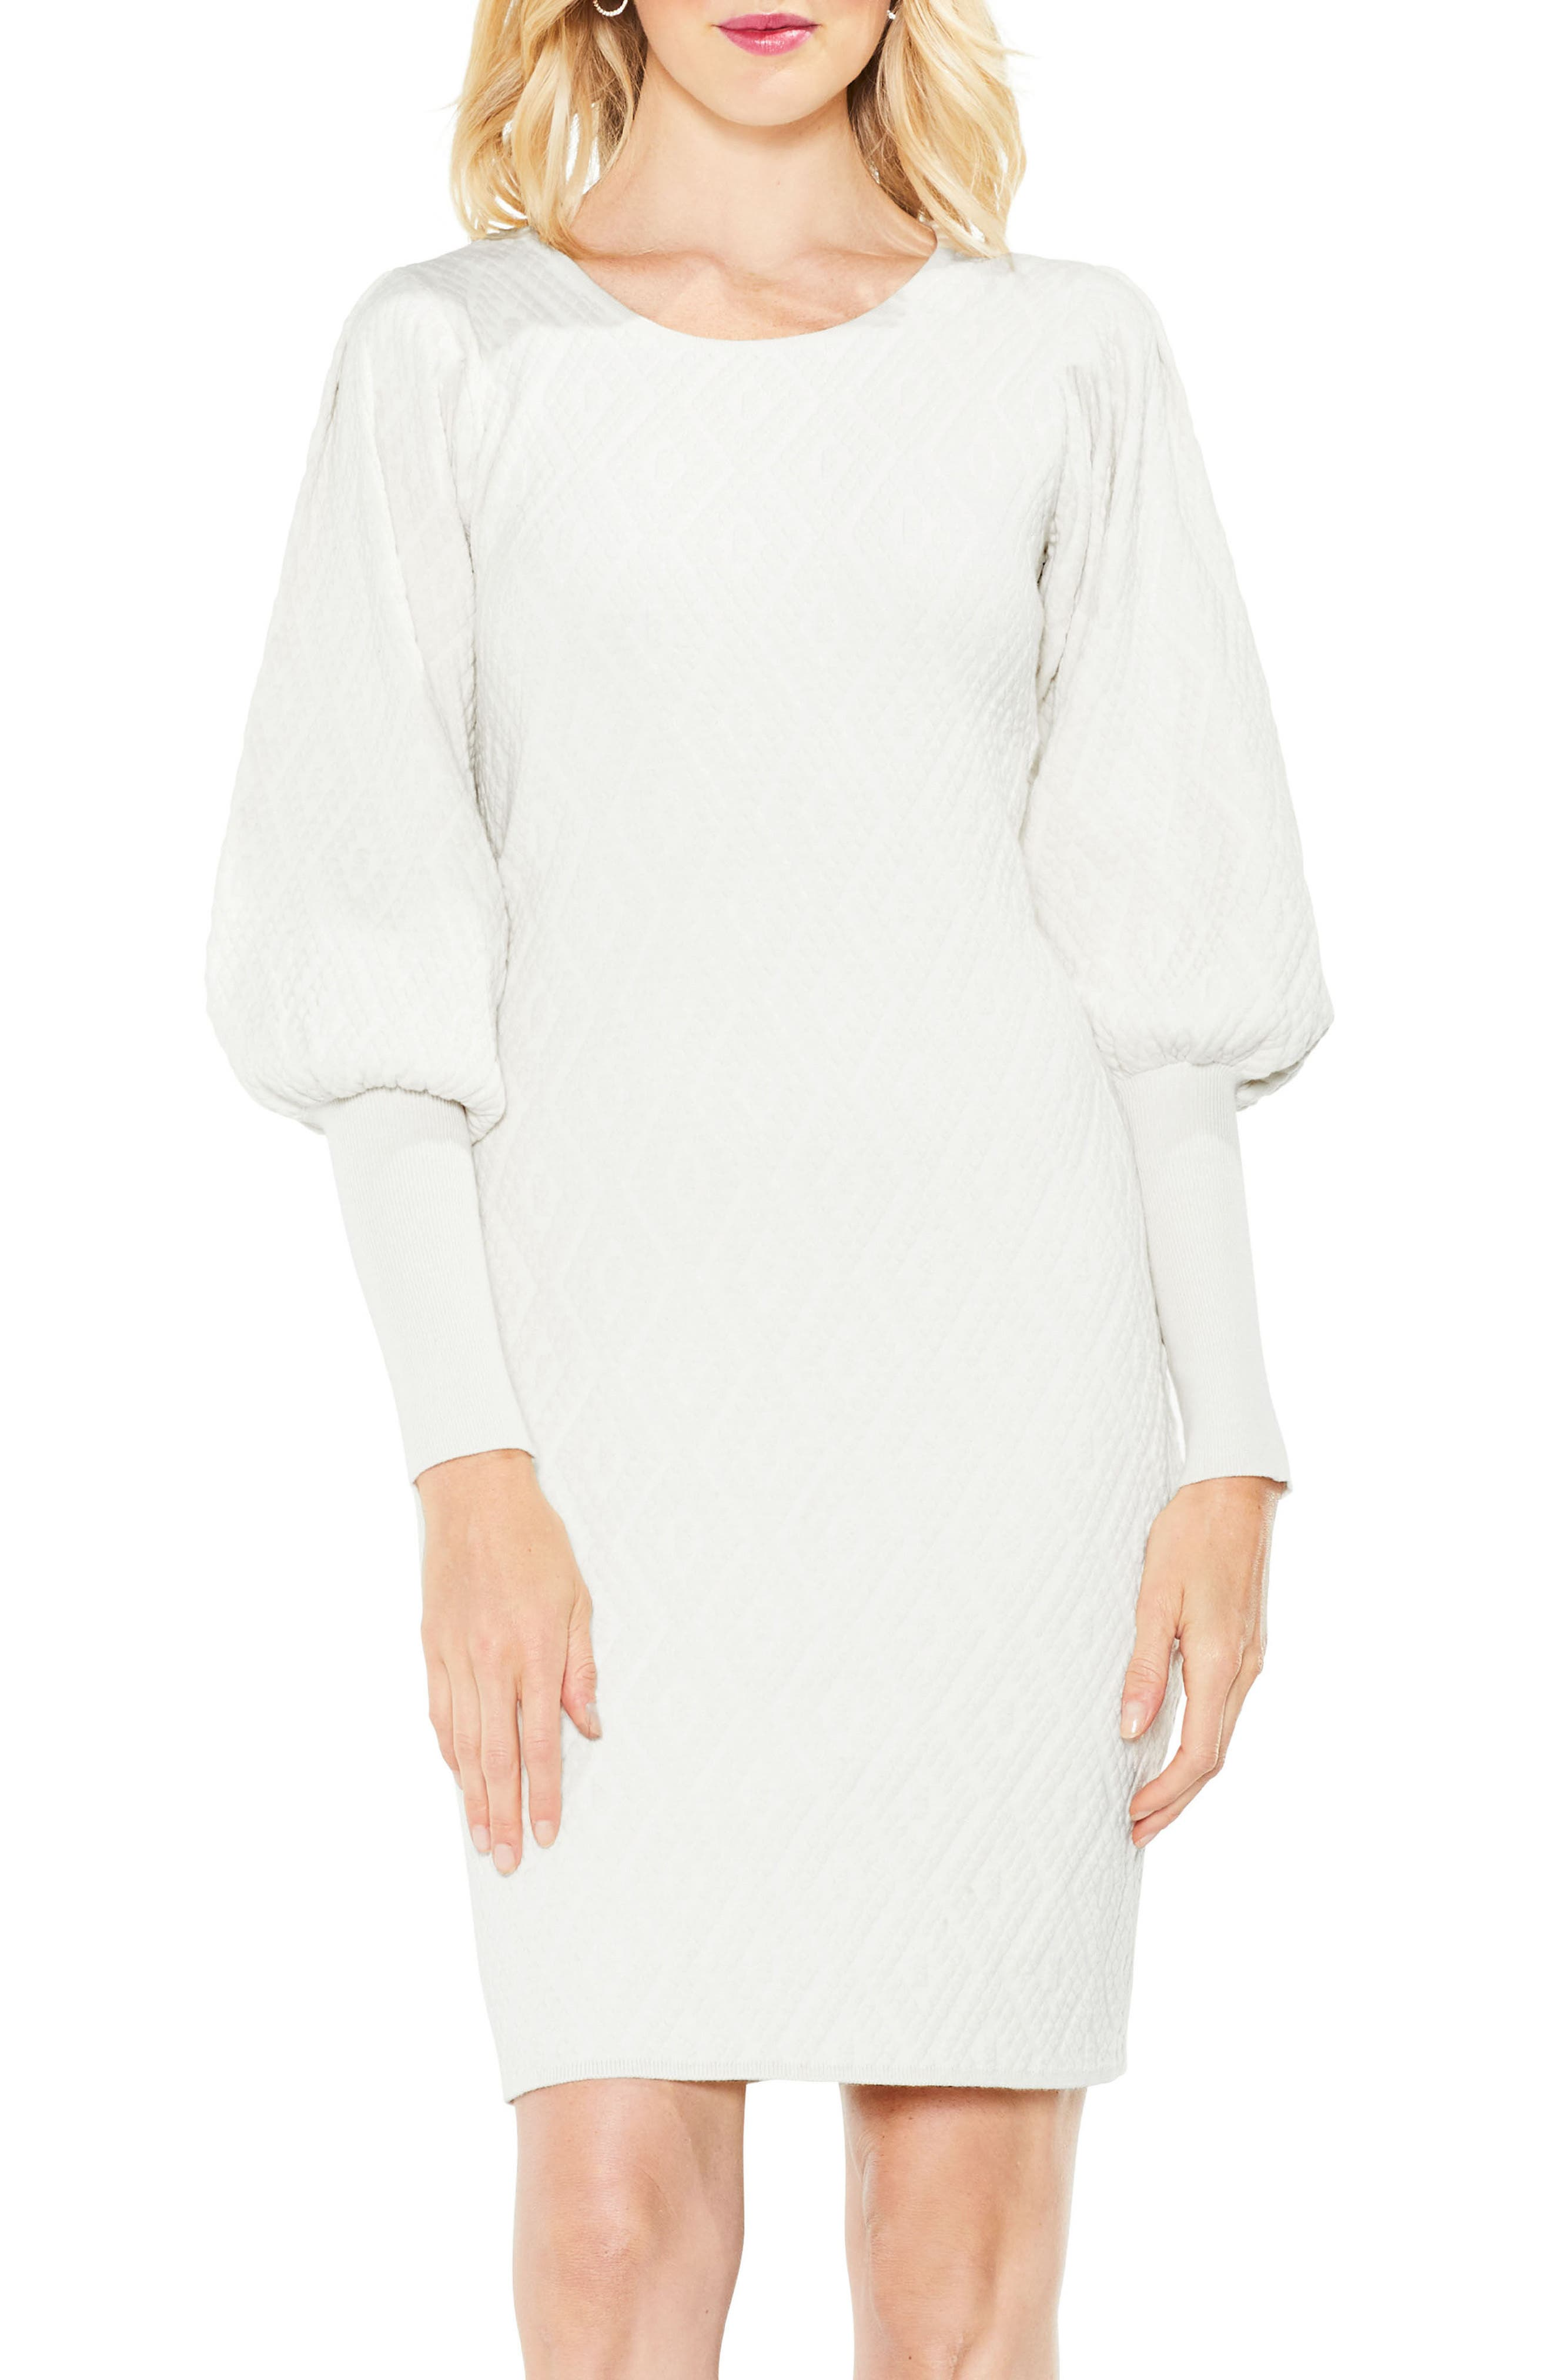 Vince Camuto Bubble Sleeve Textured Jacquard Dress